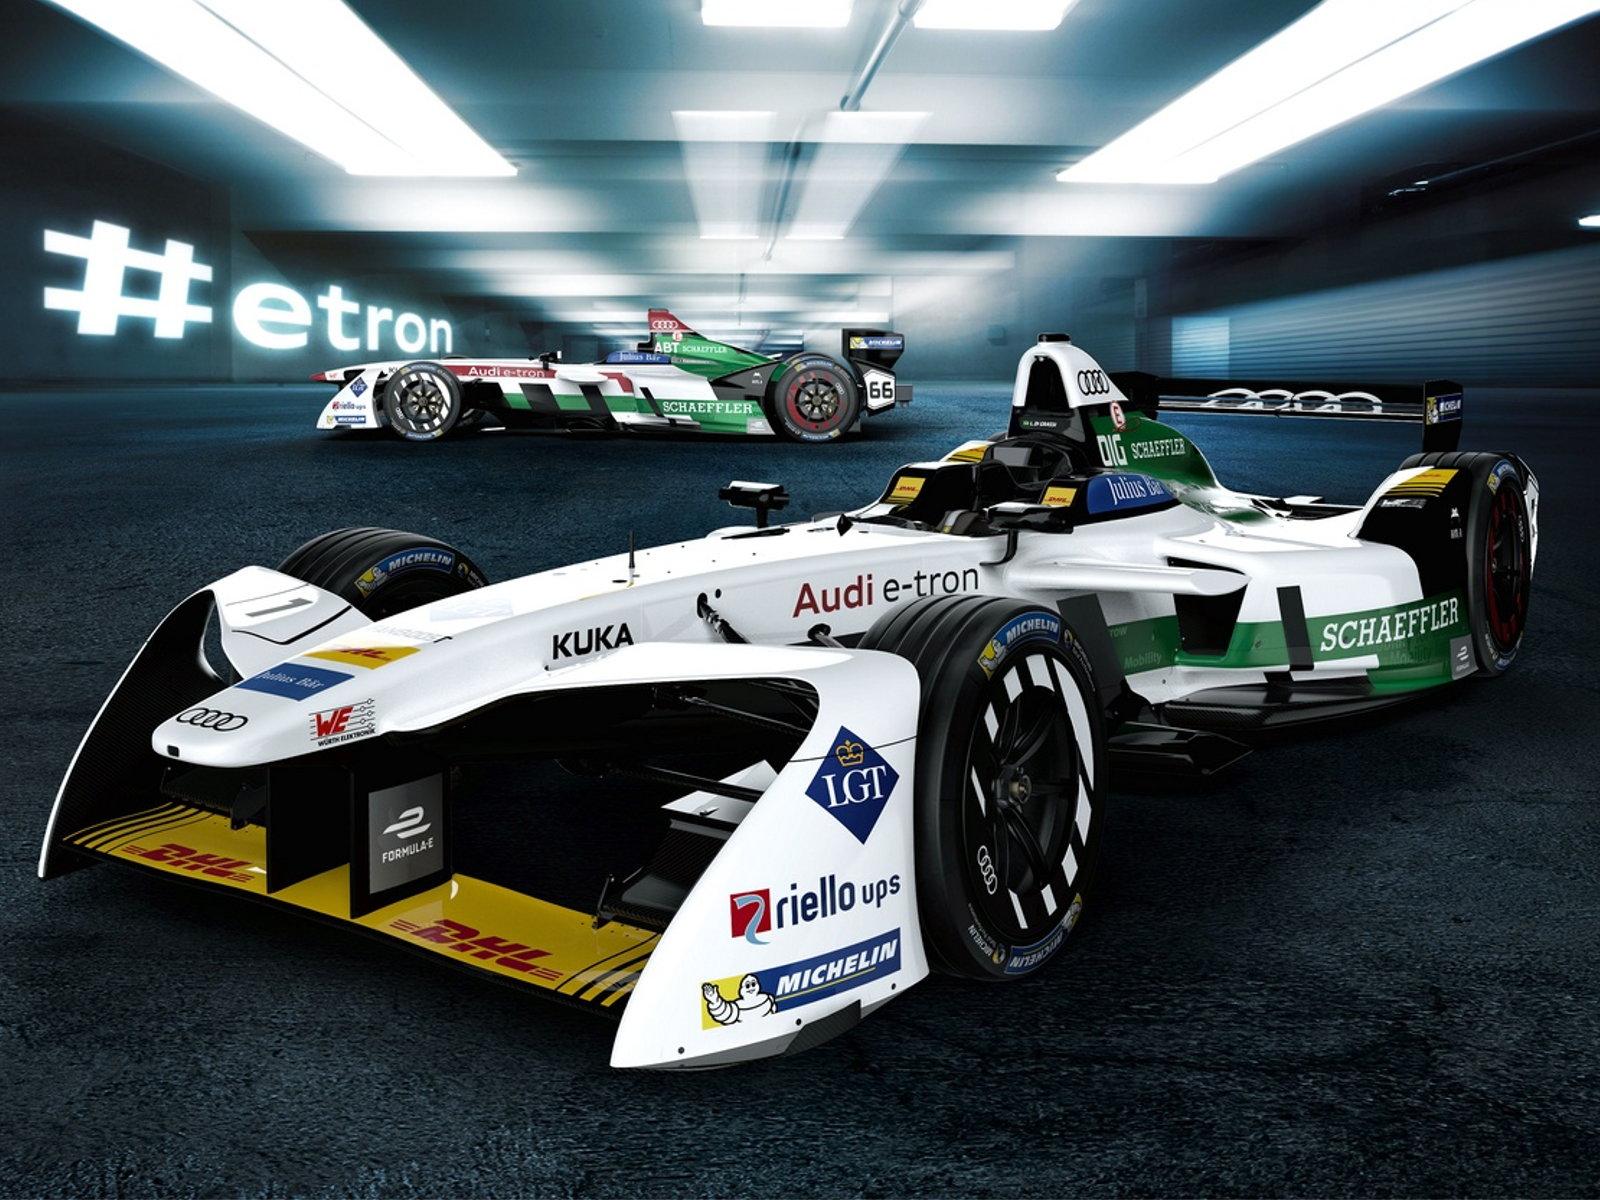 e4d1484c8c4 Riello UPS races into the future with Formula E - ACE Power Electronics